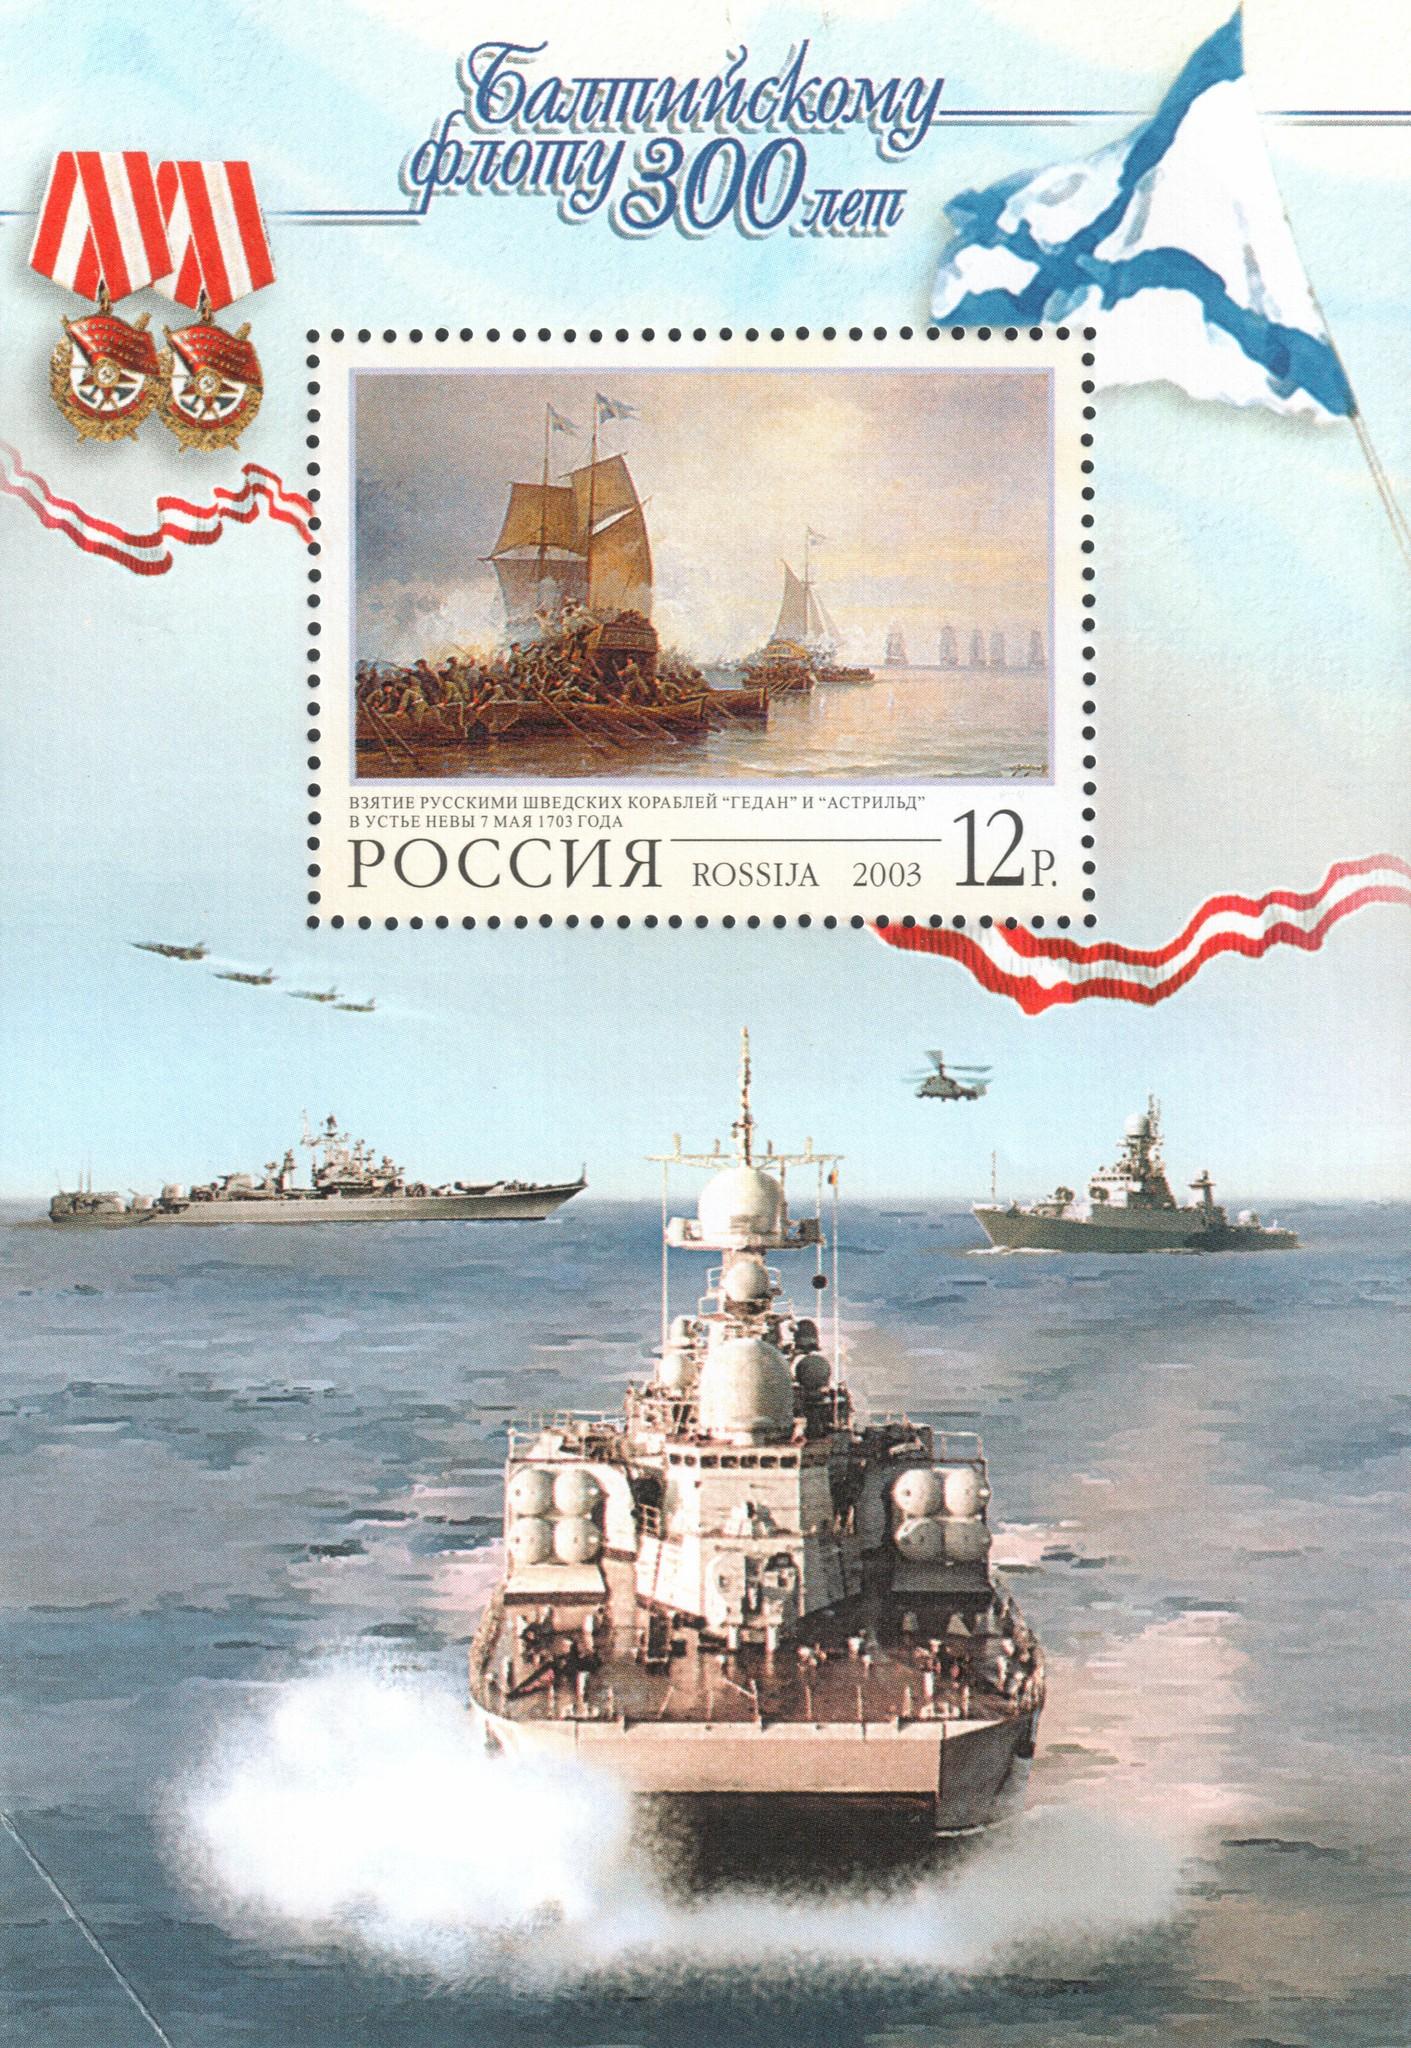 Юбилей Балтийского флота